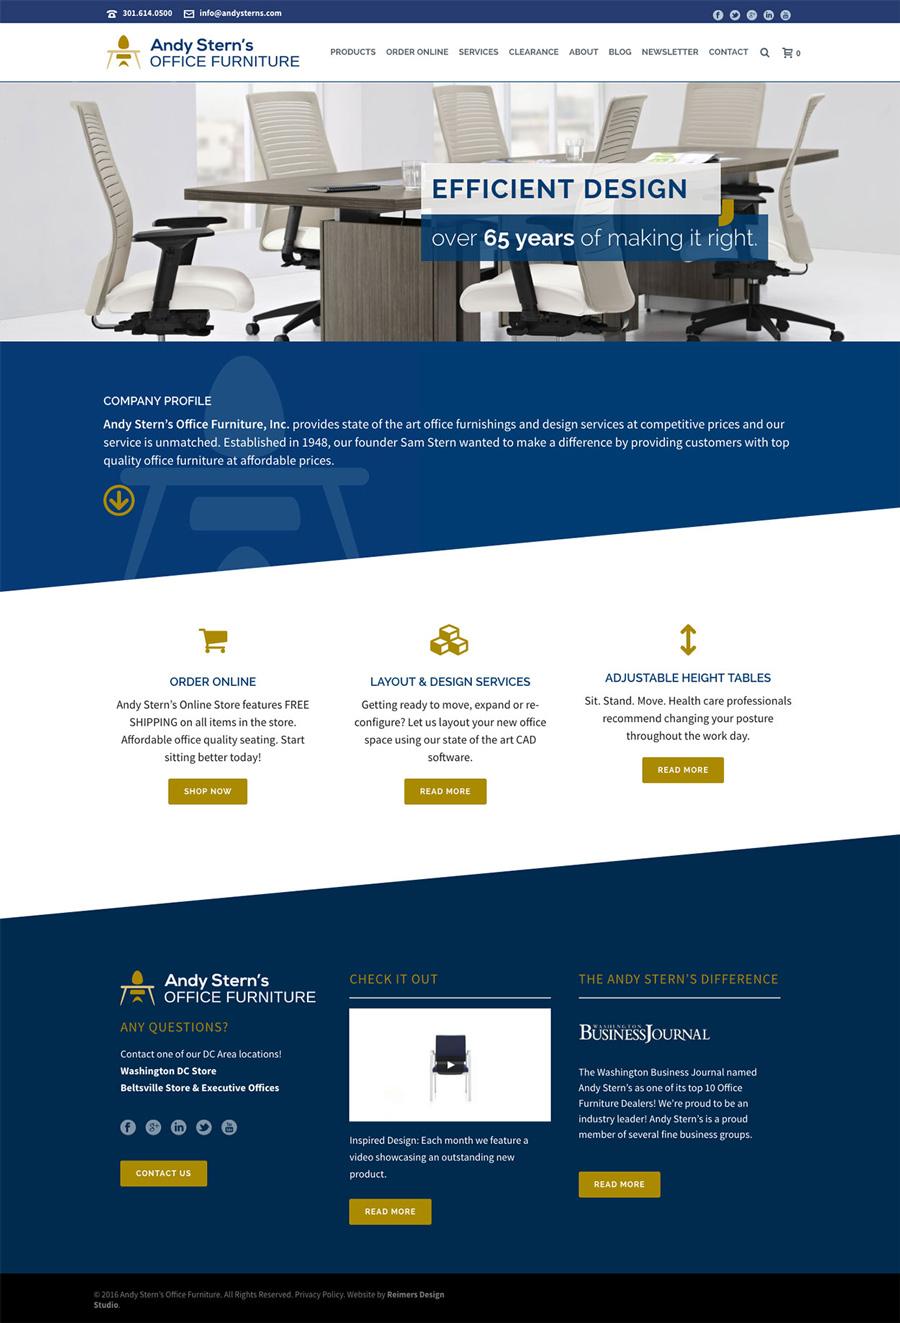 Andy Stern's Furniture Website Design